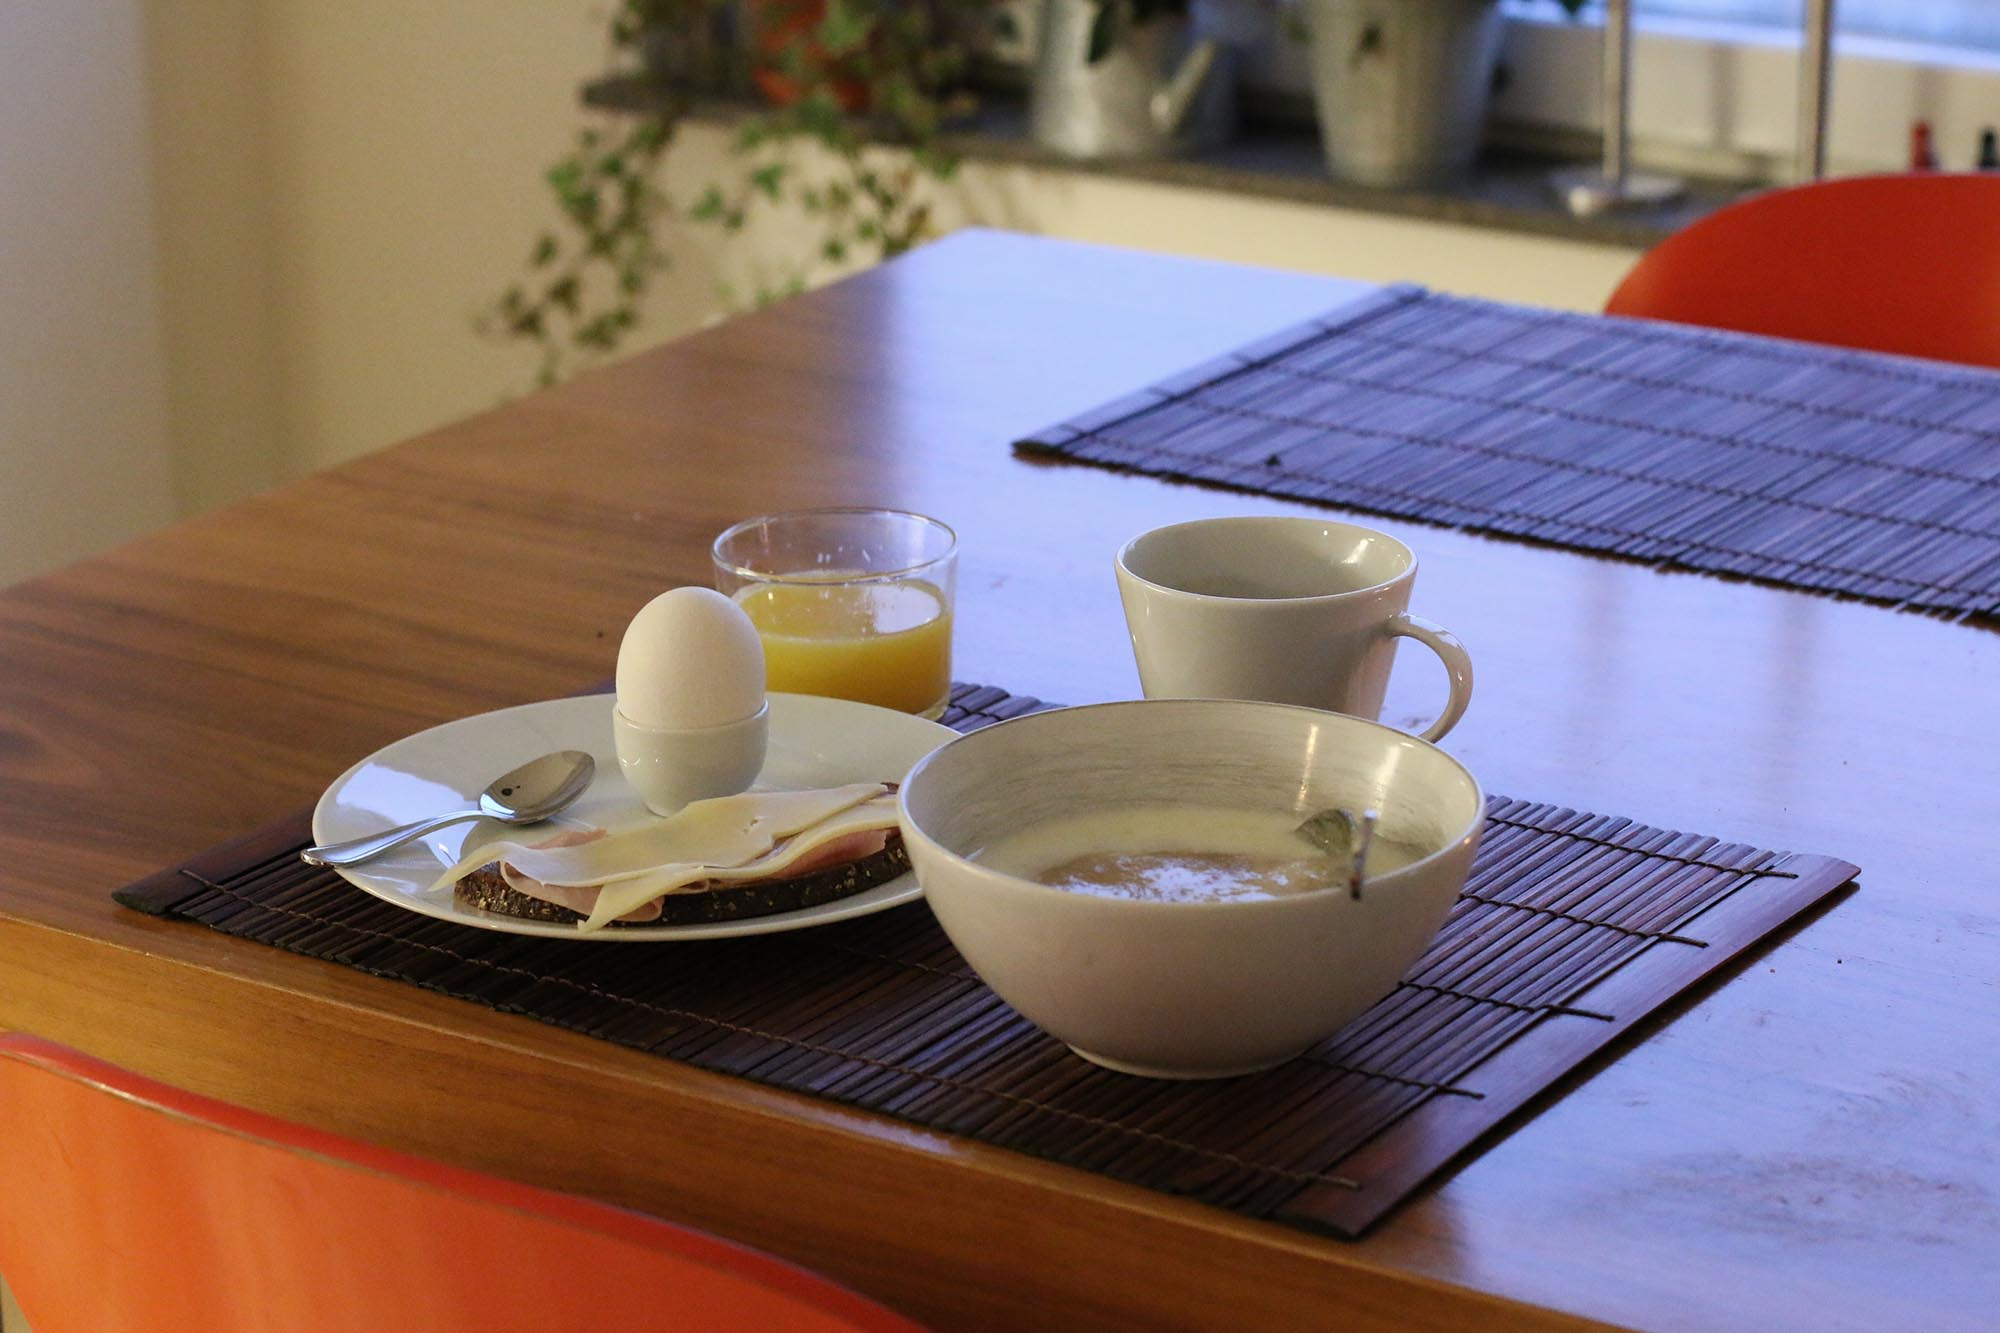 Grötfrukost under tystnad